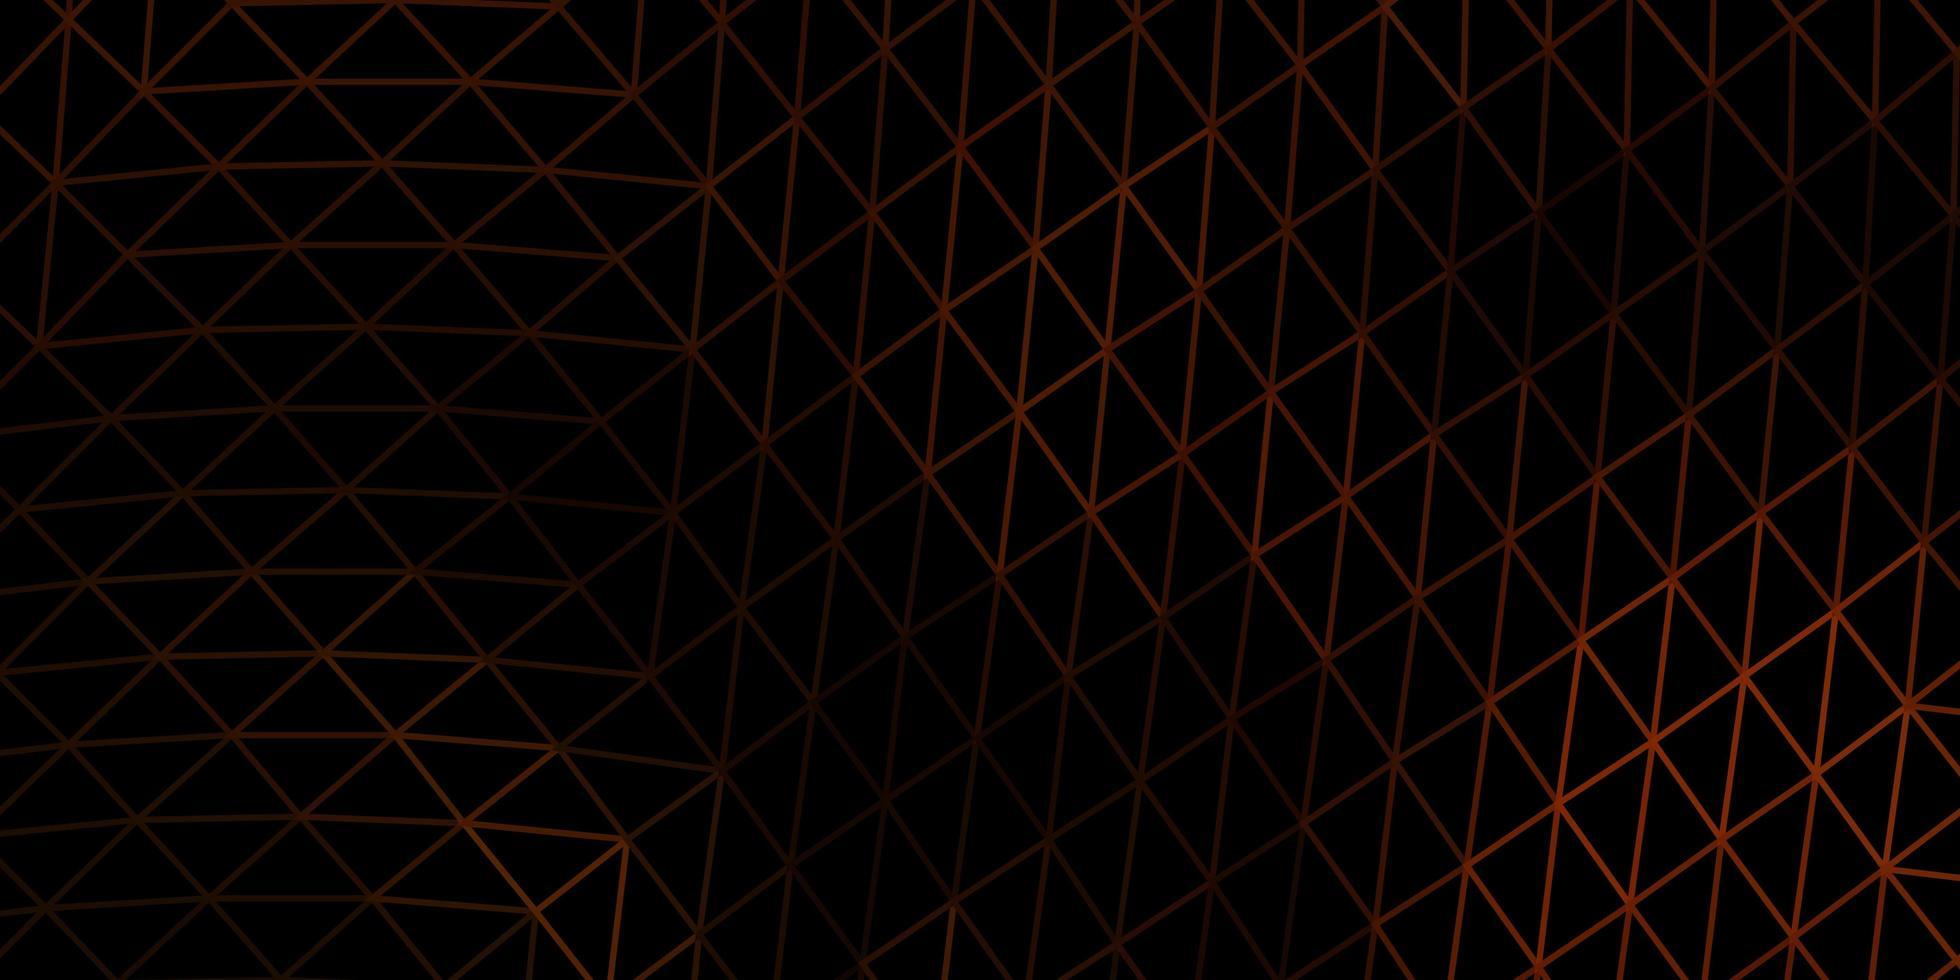 mörk orange vektor gradient polygon design.